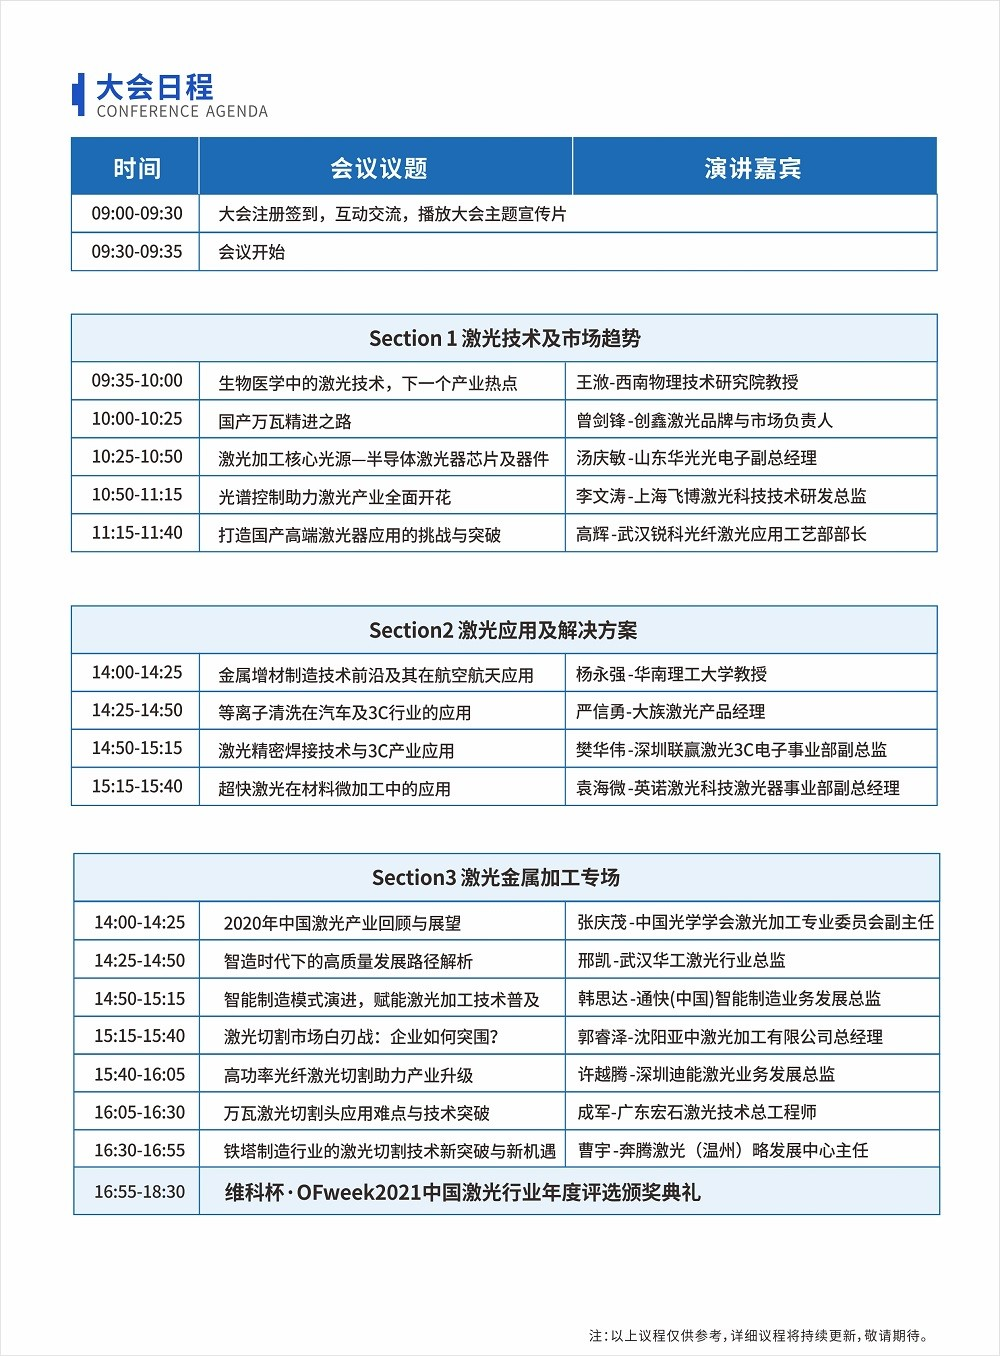 "OFweek 2021(第十八届)先进激光技术应用峰会暨""维科杯""年度评选颁奖典礼即将举办"